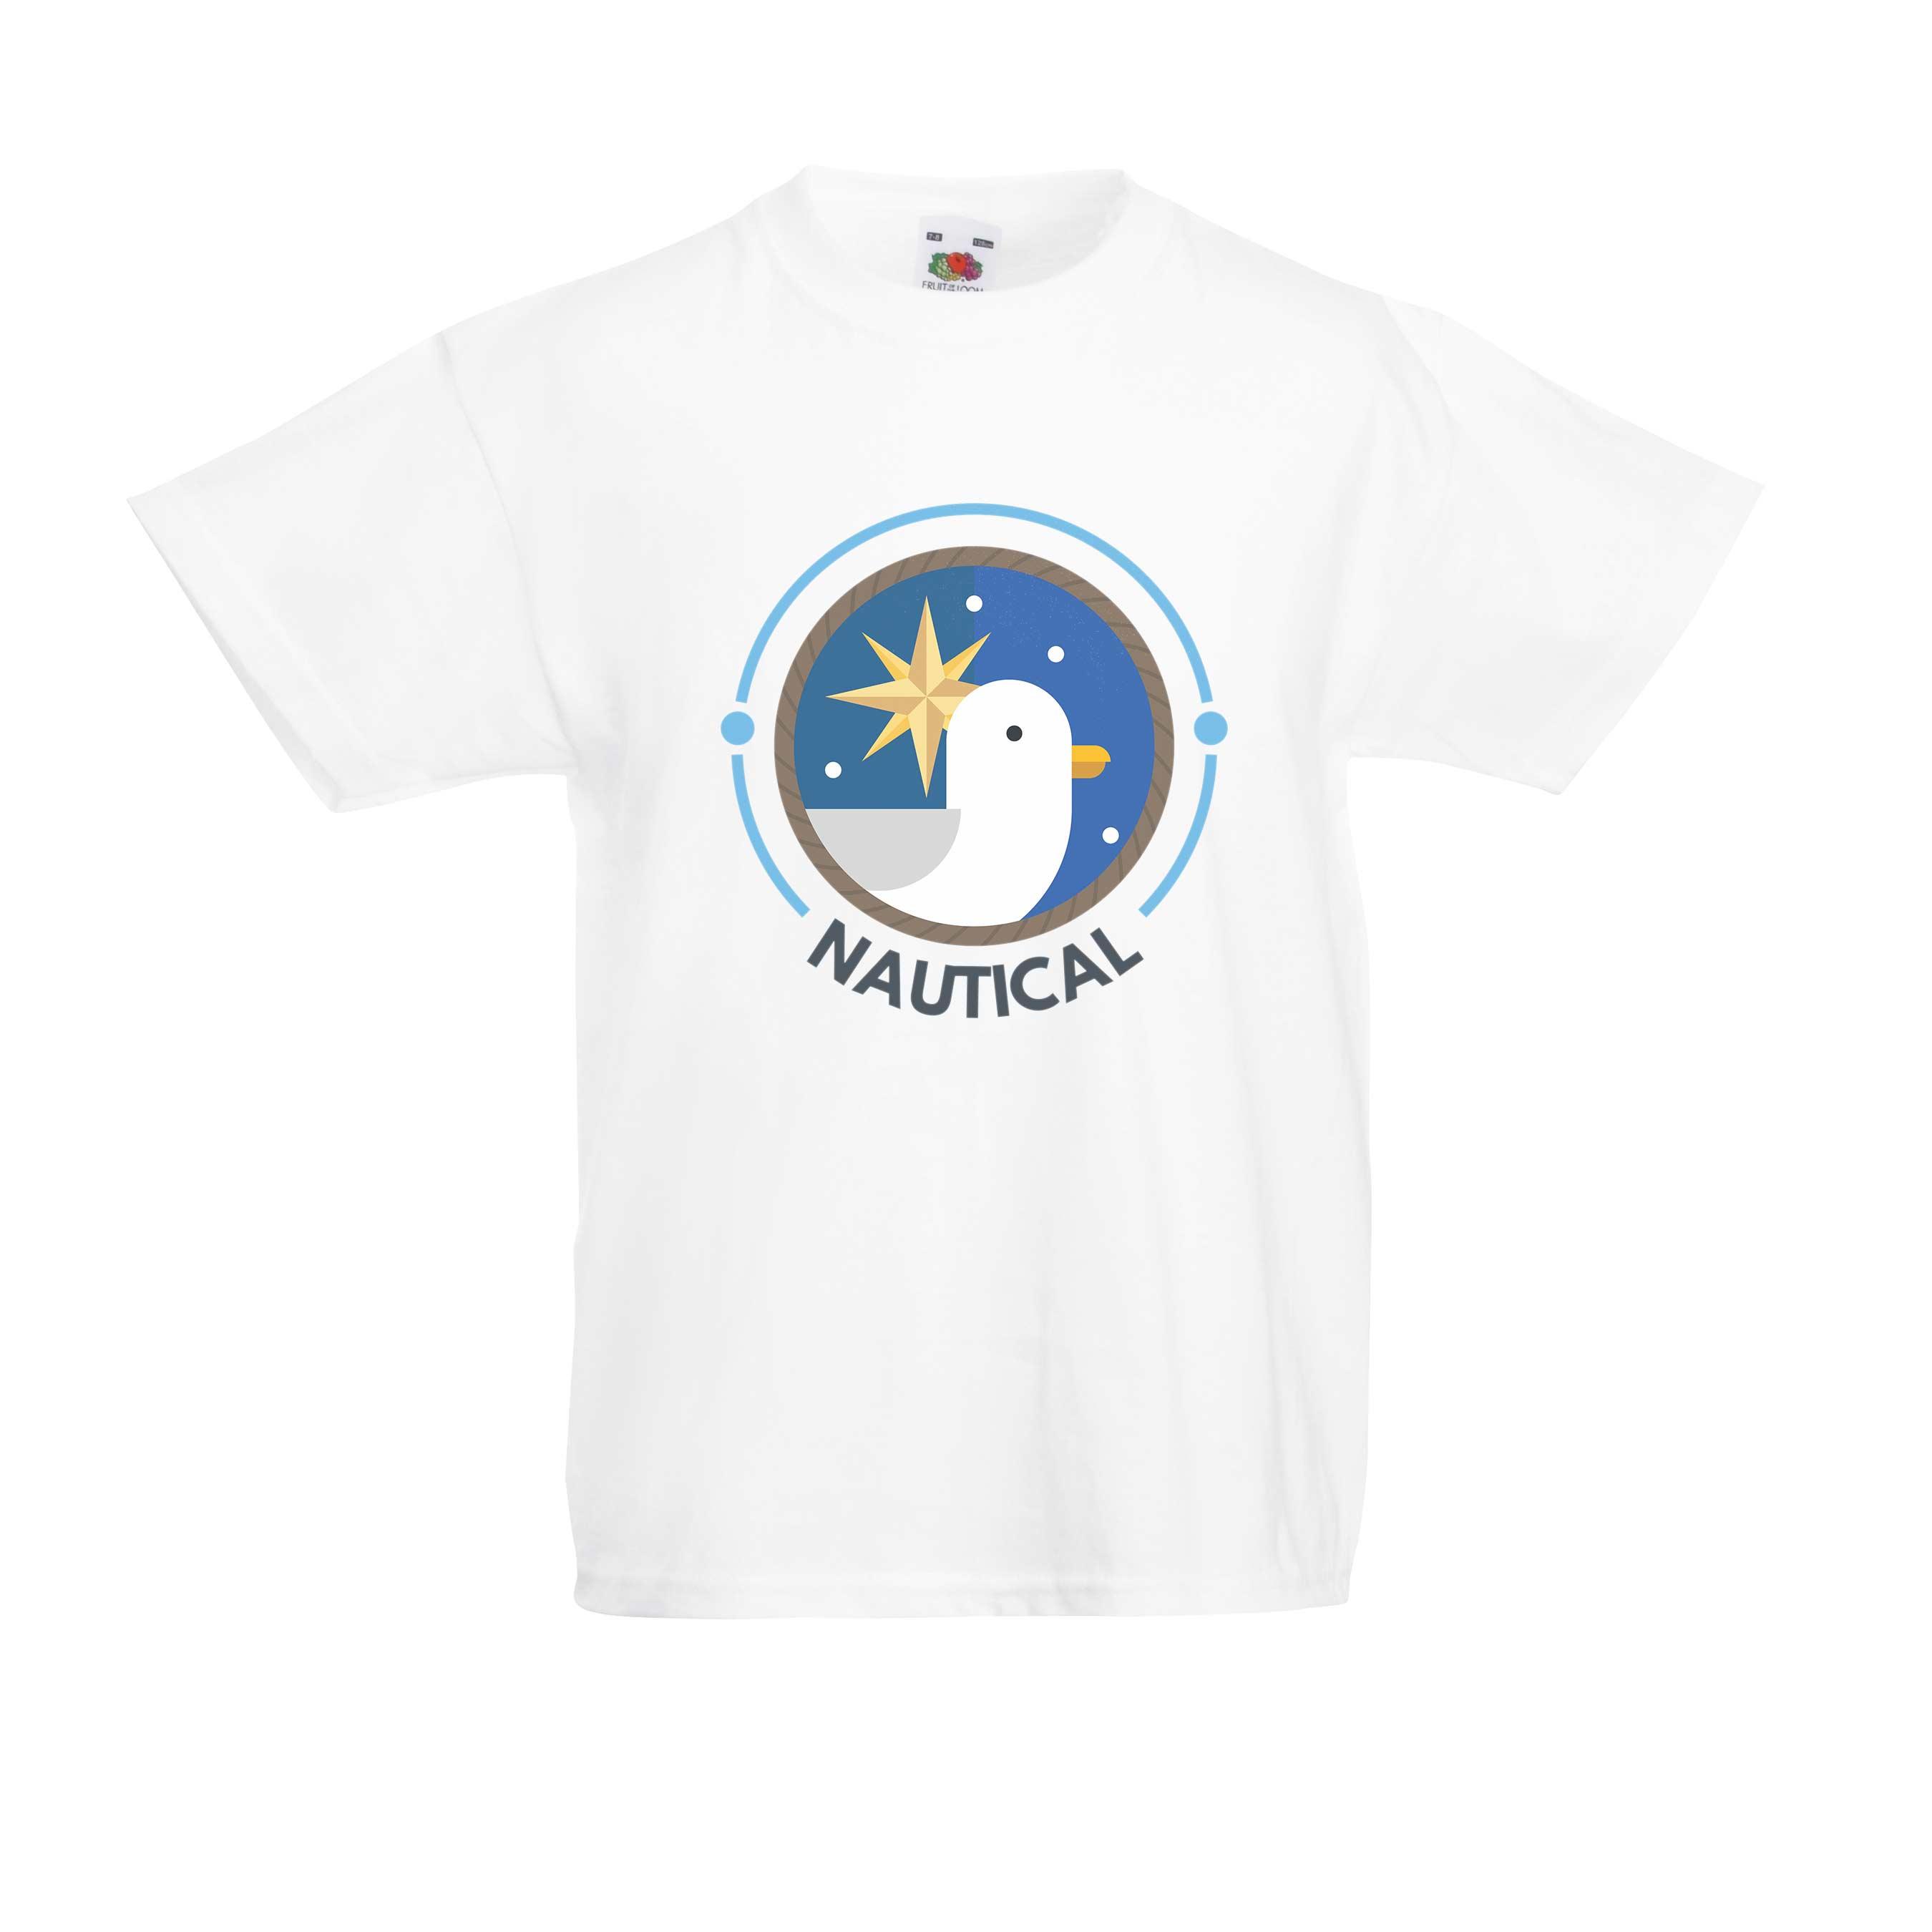 Seagul Nautical design for t-shirt, hoodie & sweatshirt